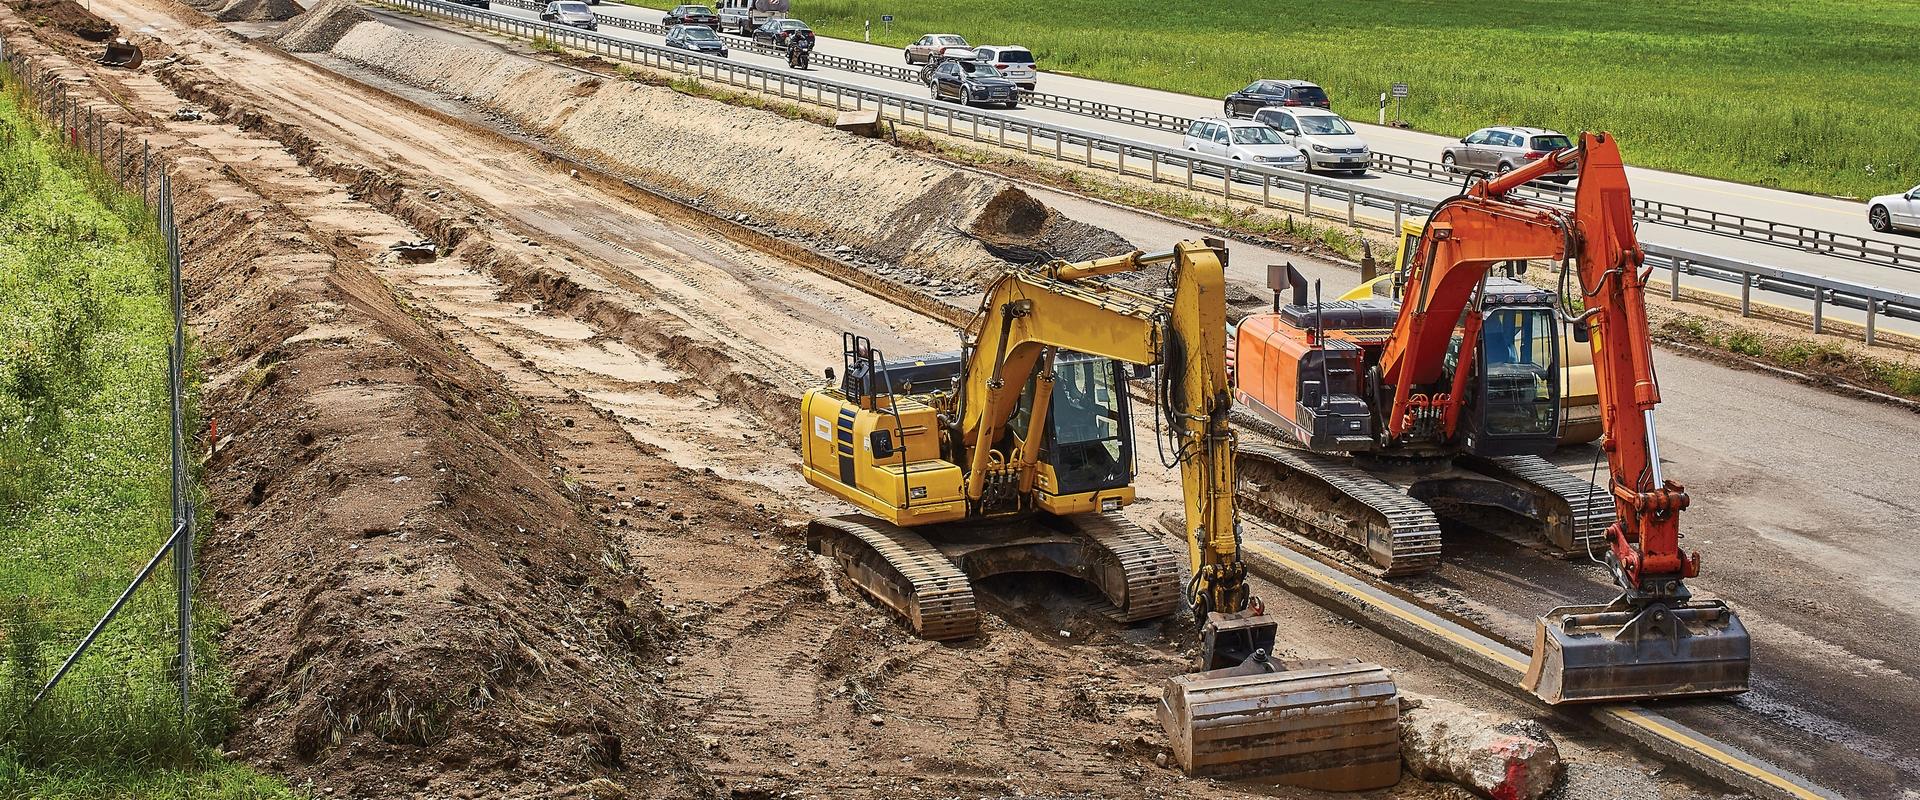 4320x1800-software-road-highways